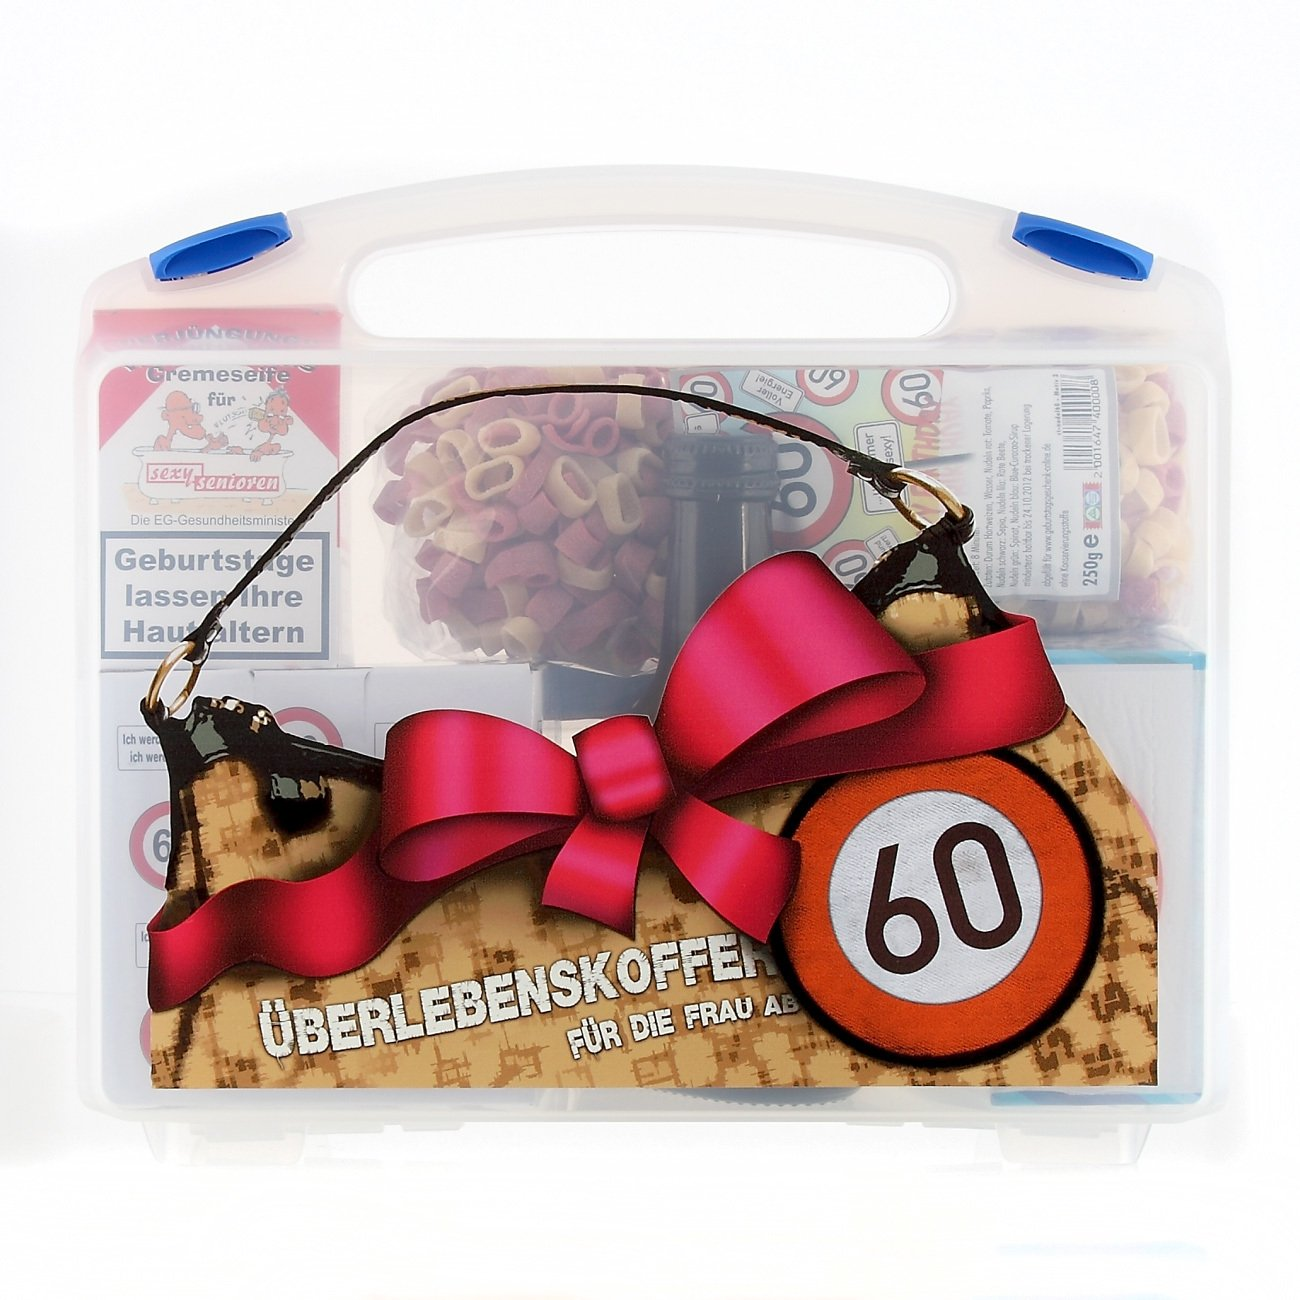 Lustige Apotheke Überlebenskoffer für die Frau ab 60 (8 teilig) Lustapotheke®